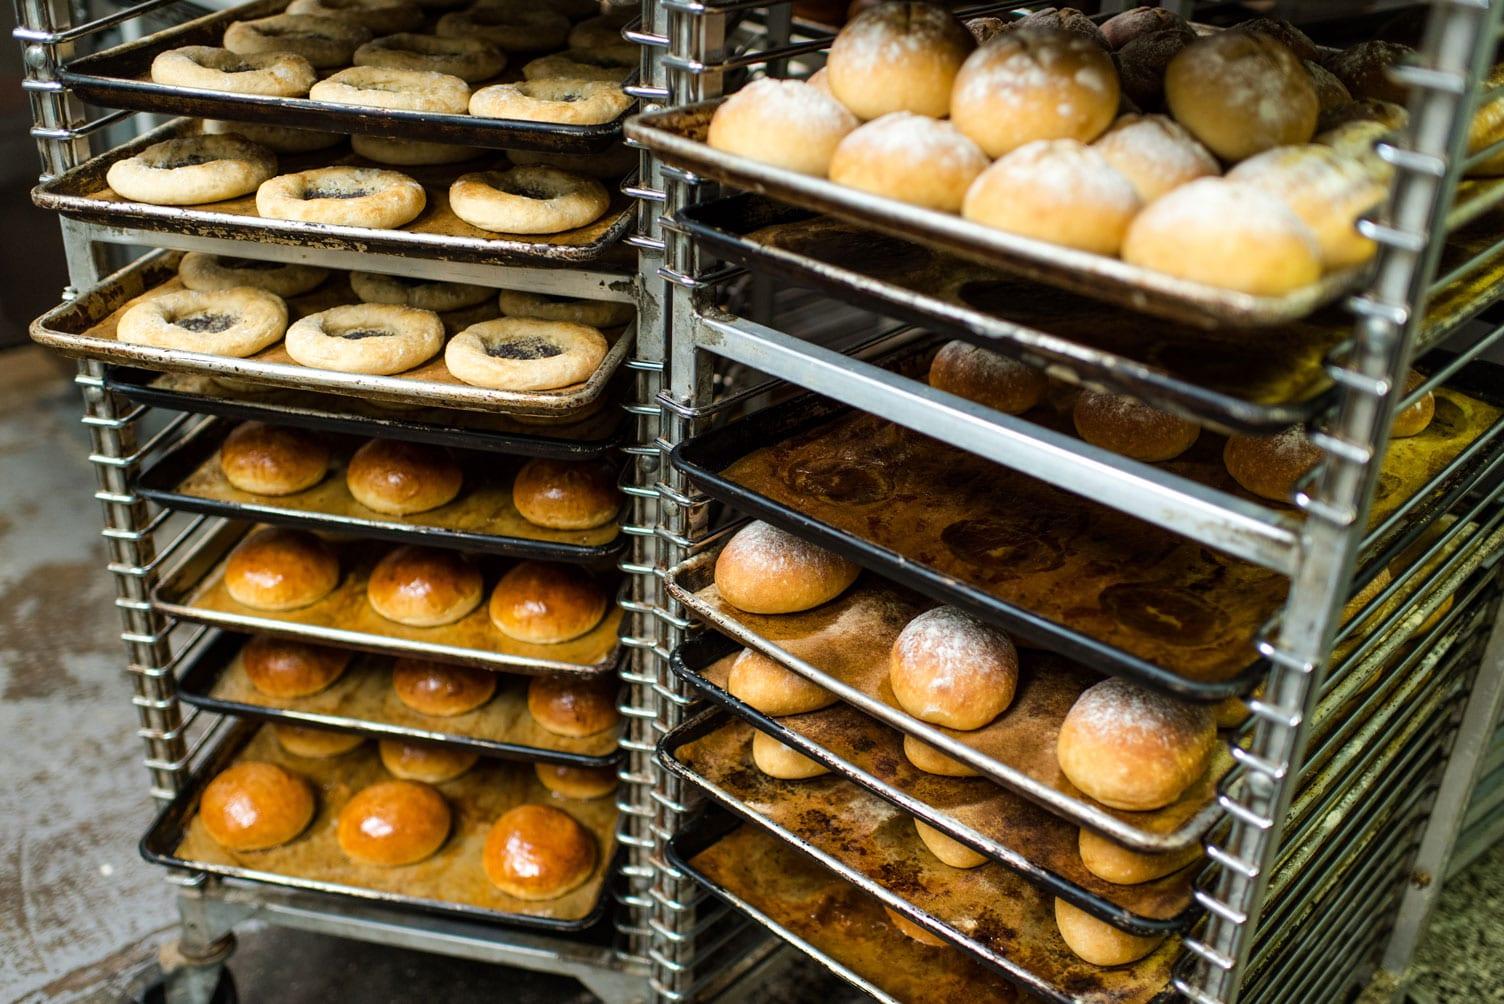 Stalzy's Deli and Bakery Bread